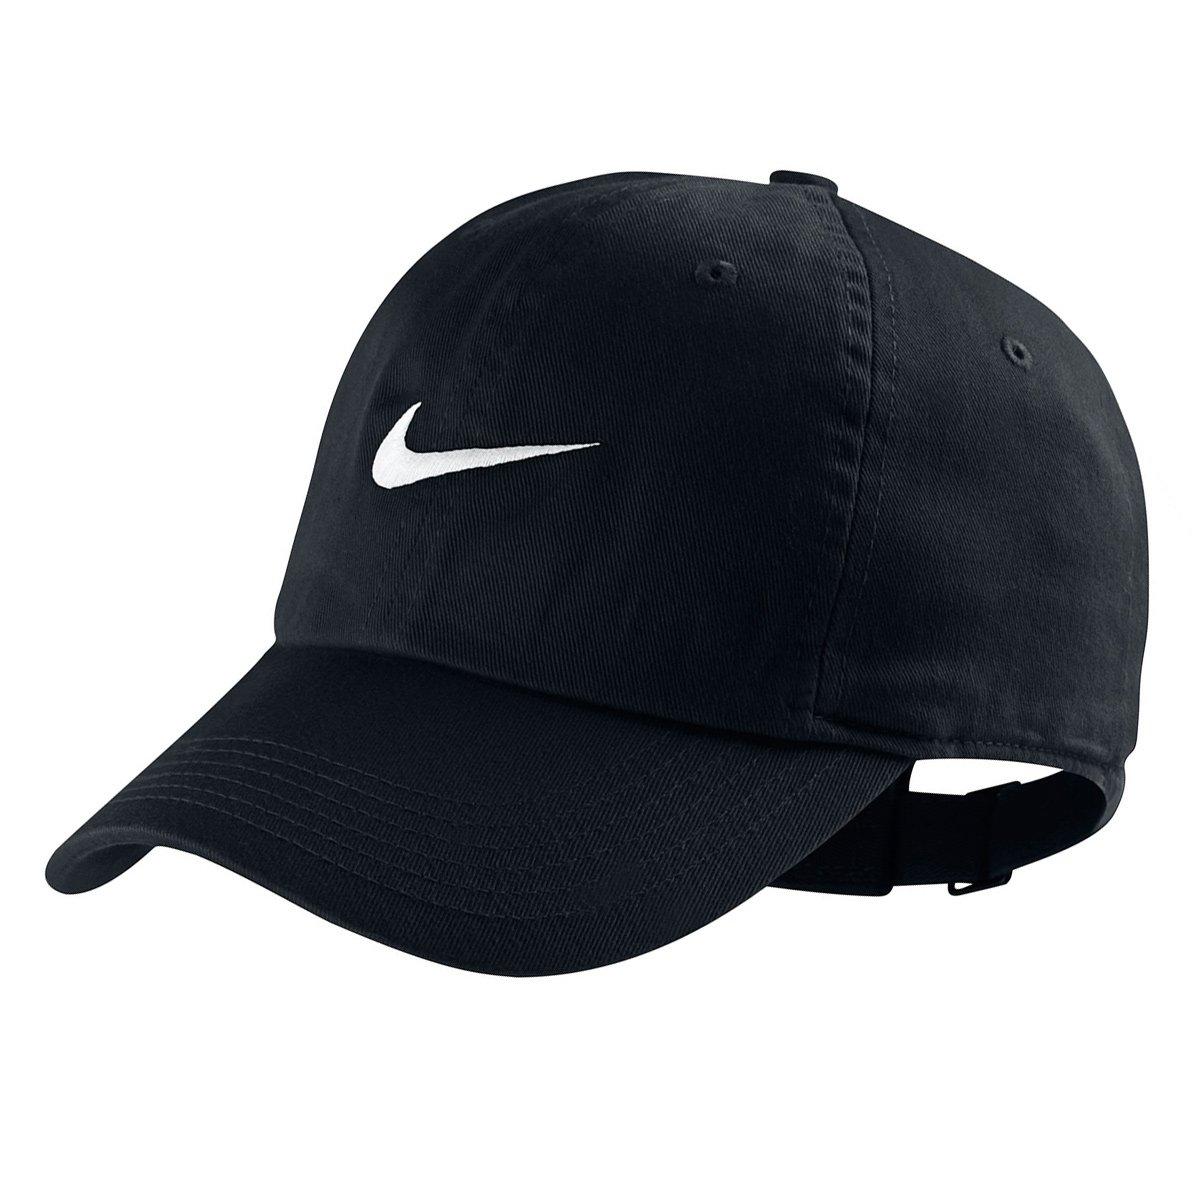 Boné Infantil Nike New Swoosh Heritage - Compre Agora  b0394475f05